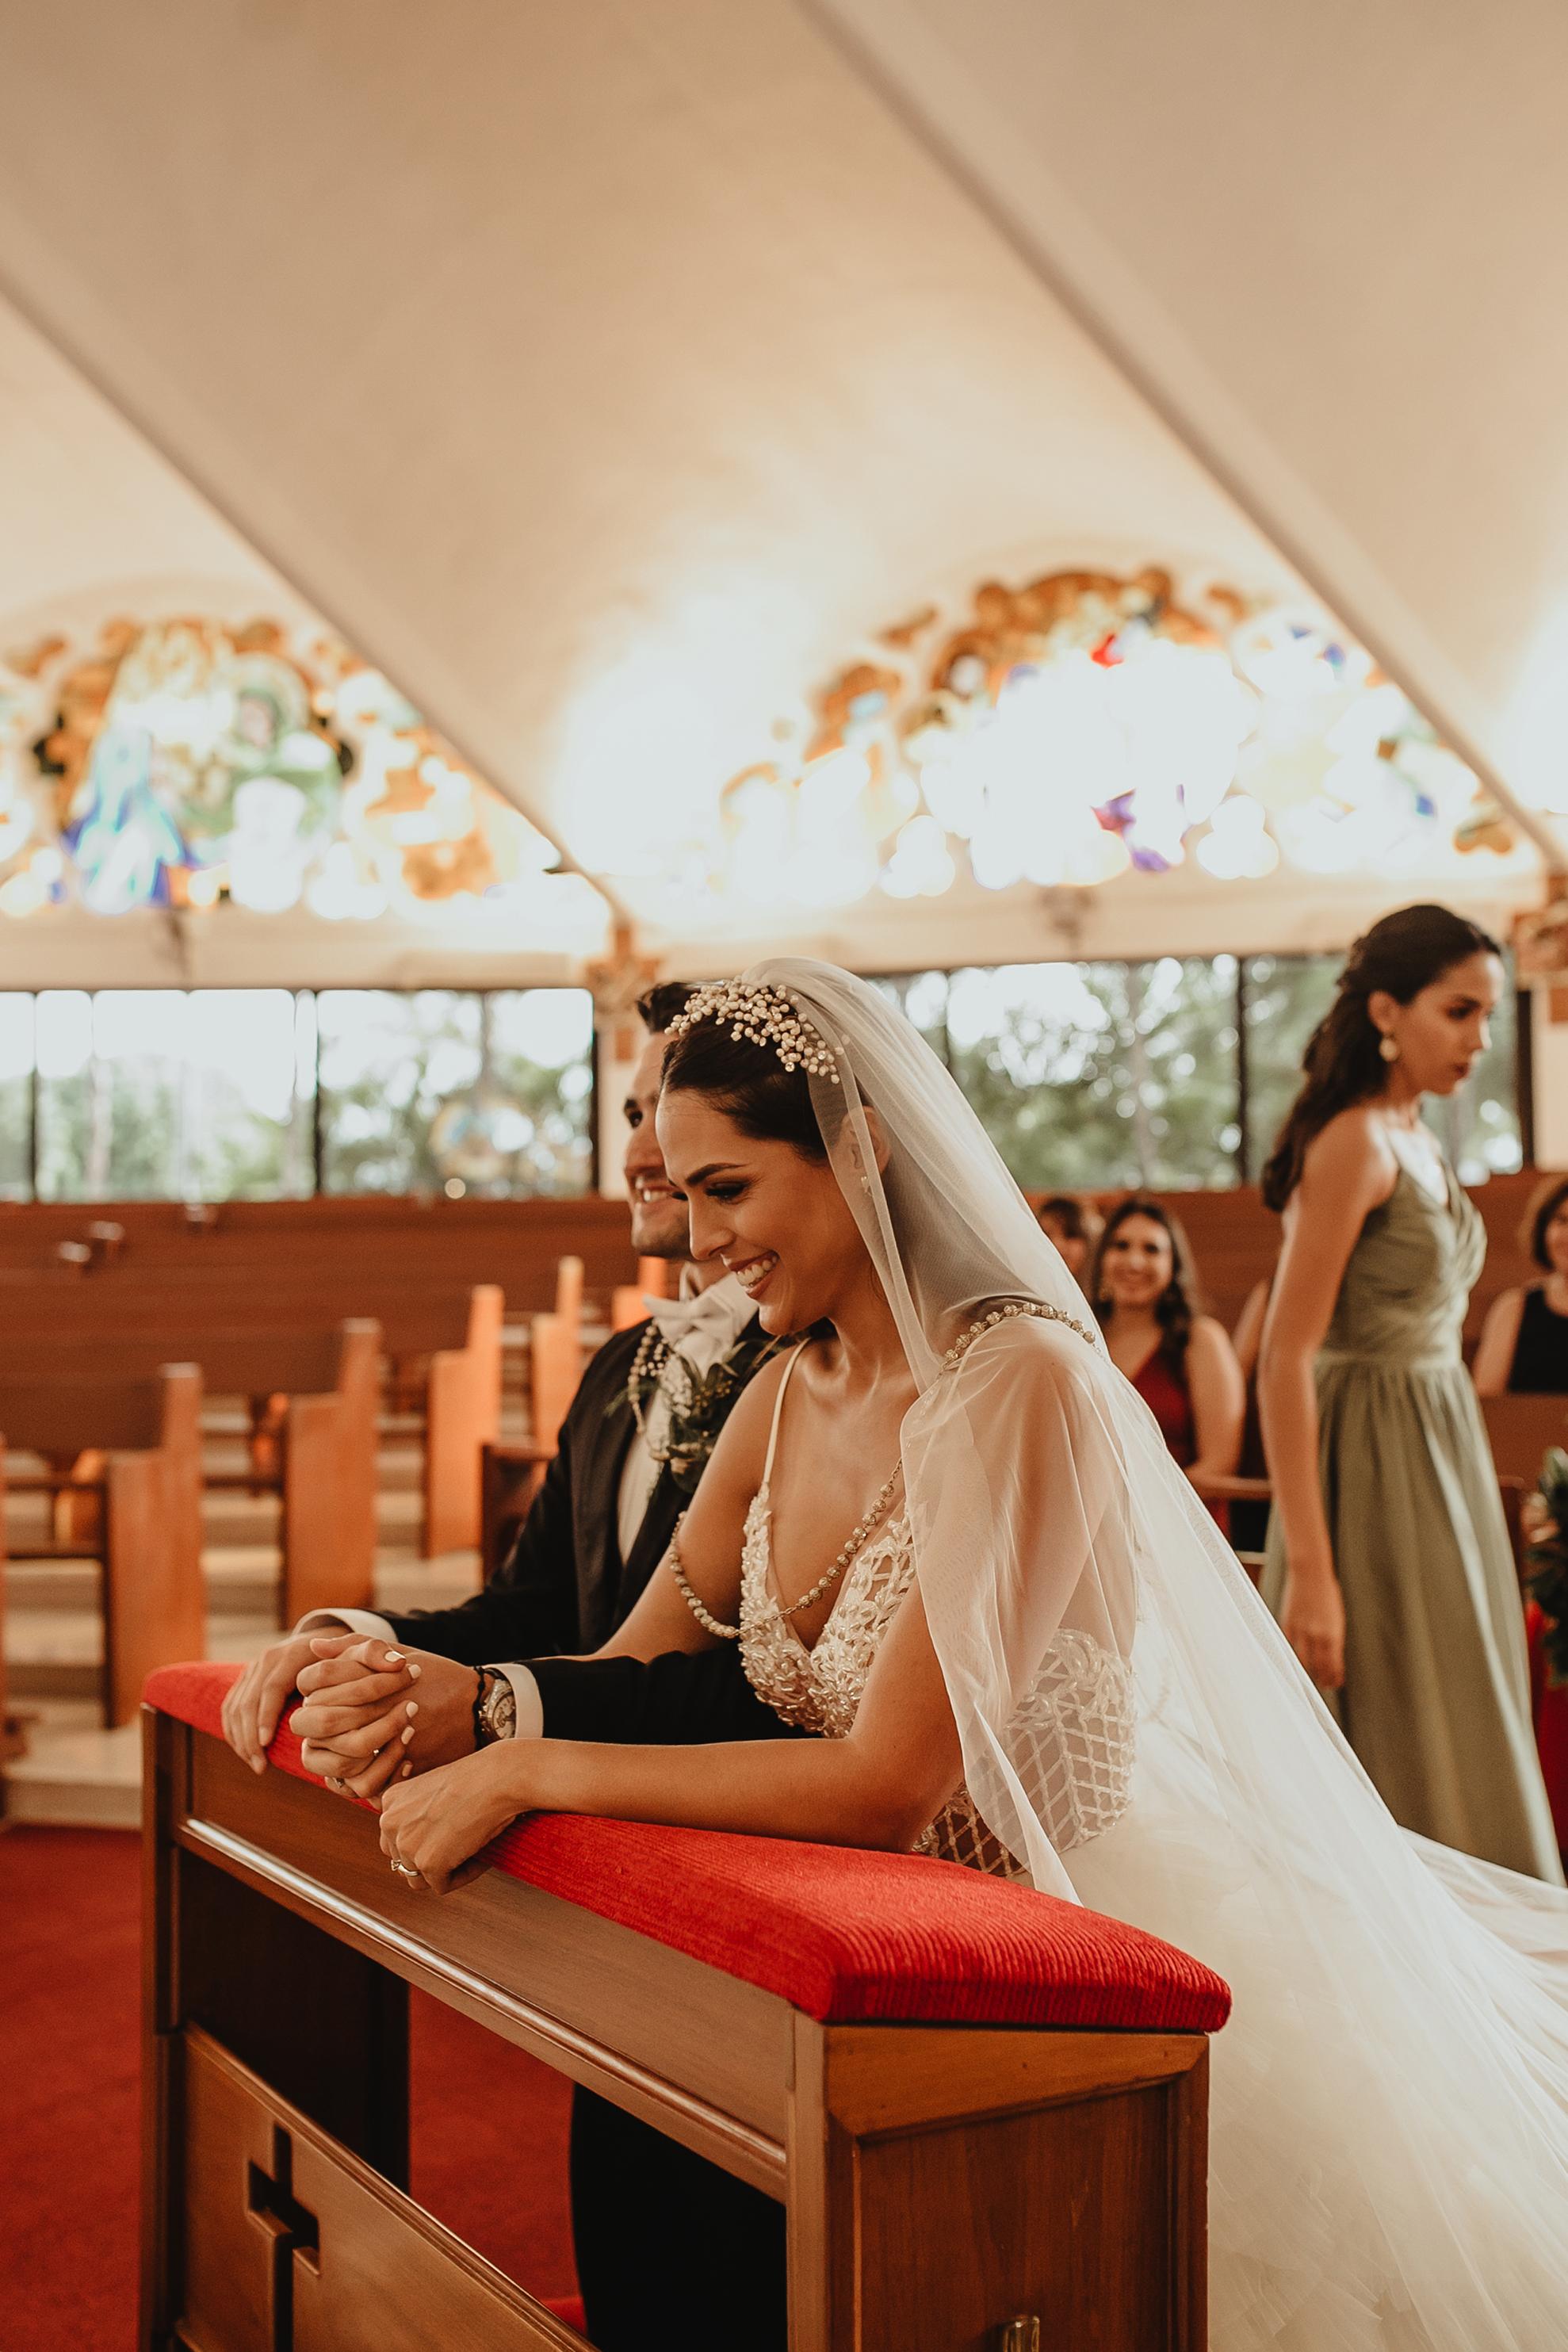 0681R&F__WeddingDestination_Weddingmerida_BodaMexico_FotografoDeBodas_FabrizioSimoneenFotografo.jpg